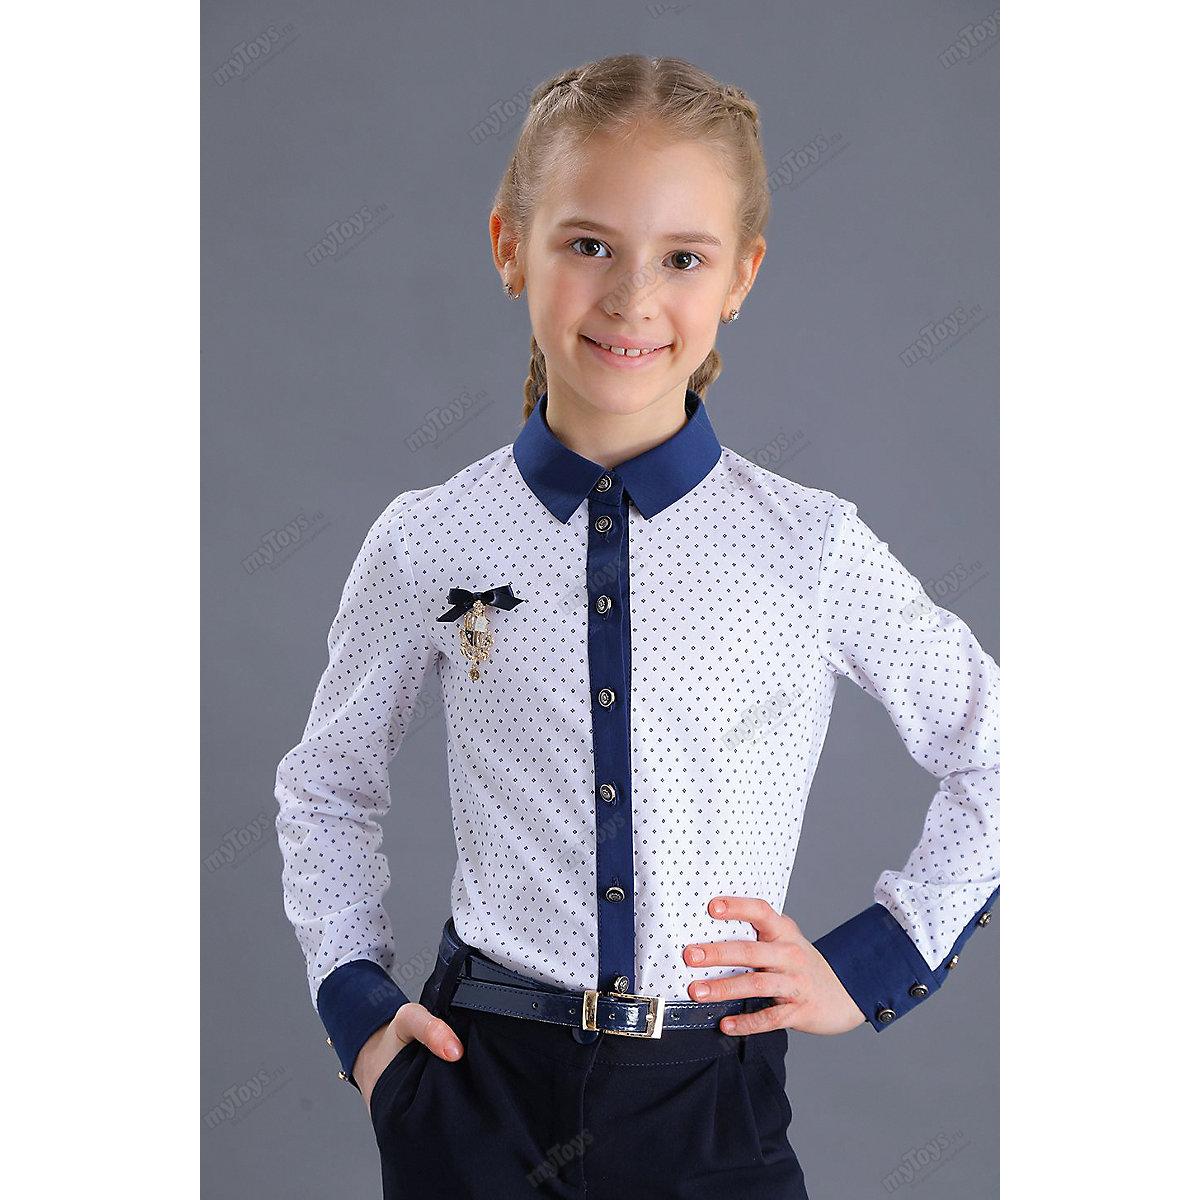 Malenkaya Lady Blouses & Shirts 11686274 blouse for girl school  clothes jacket wardrobe childrens shirt White Blue Girls Turn-down Collar